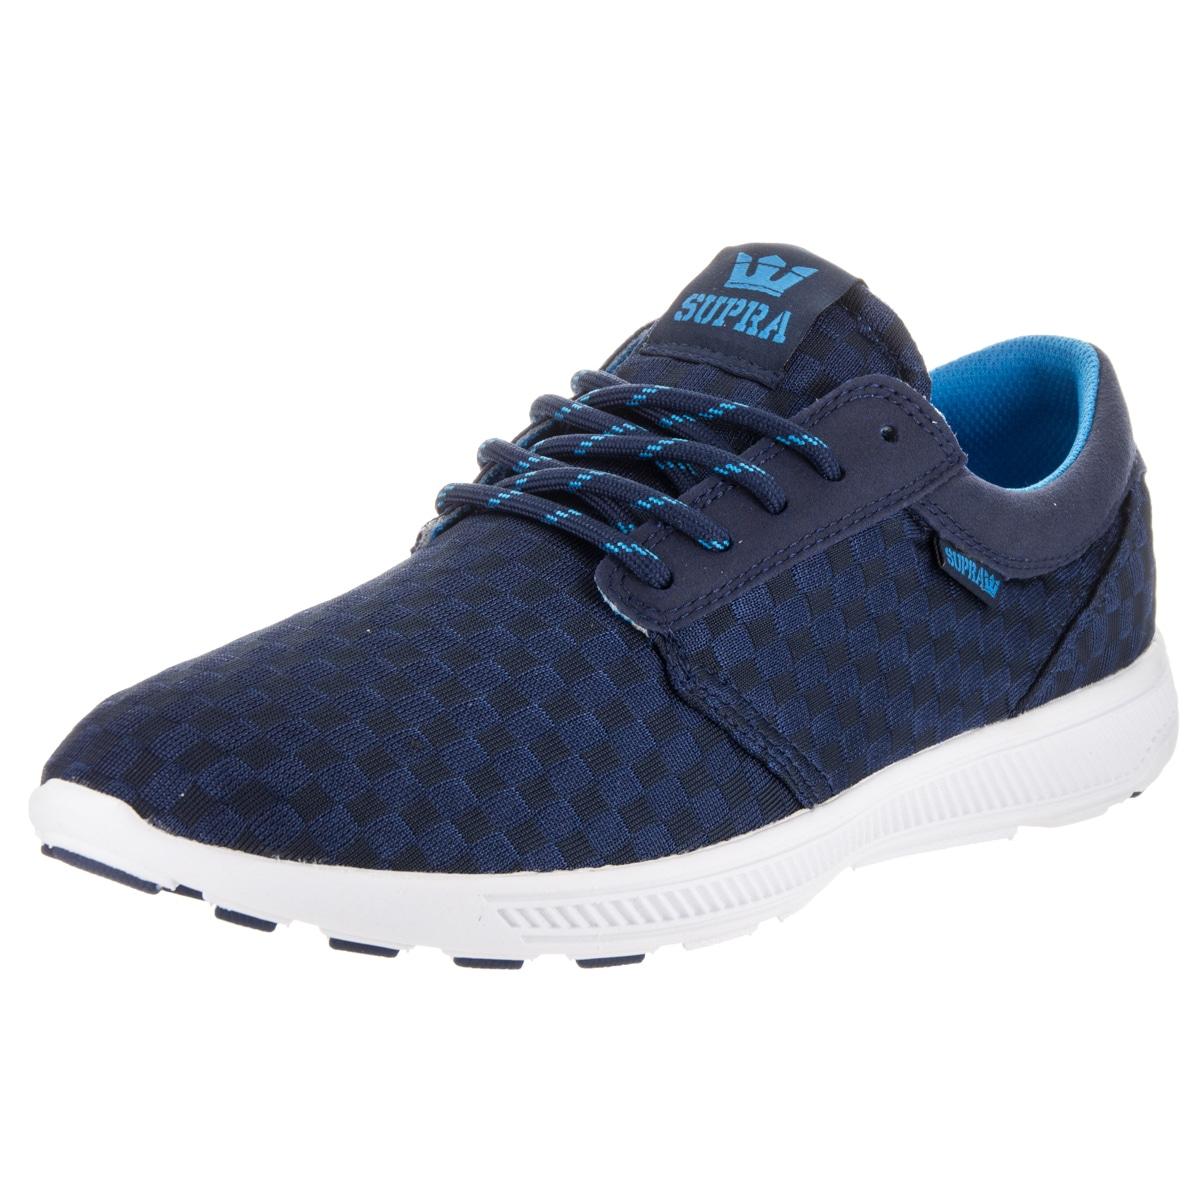 Supra Men's Hammer Run Blue Running Shoes (10) (Fabric)